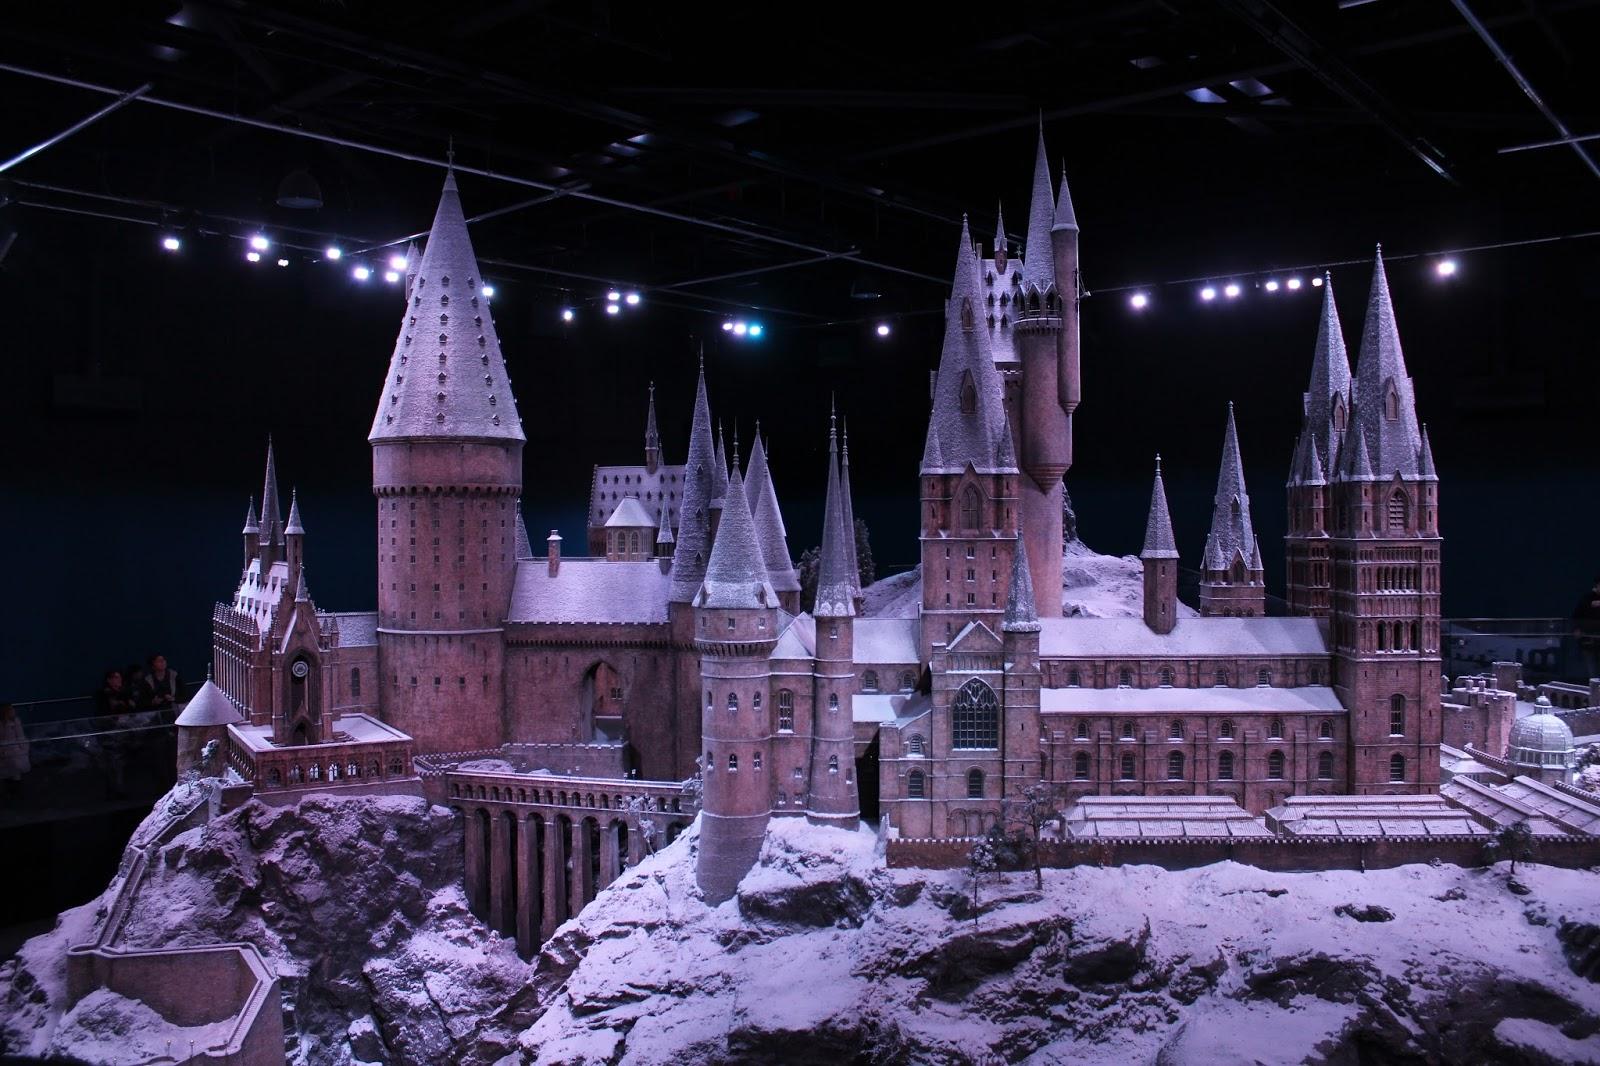 Harry Potter studio tour london Hogwarts model